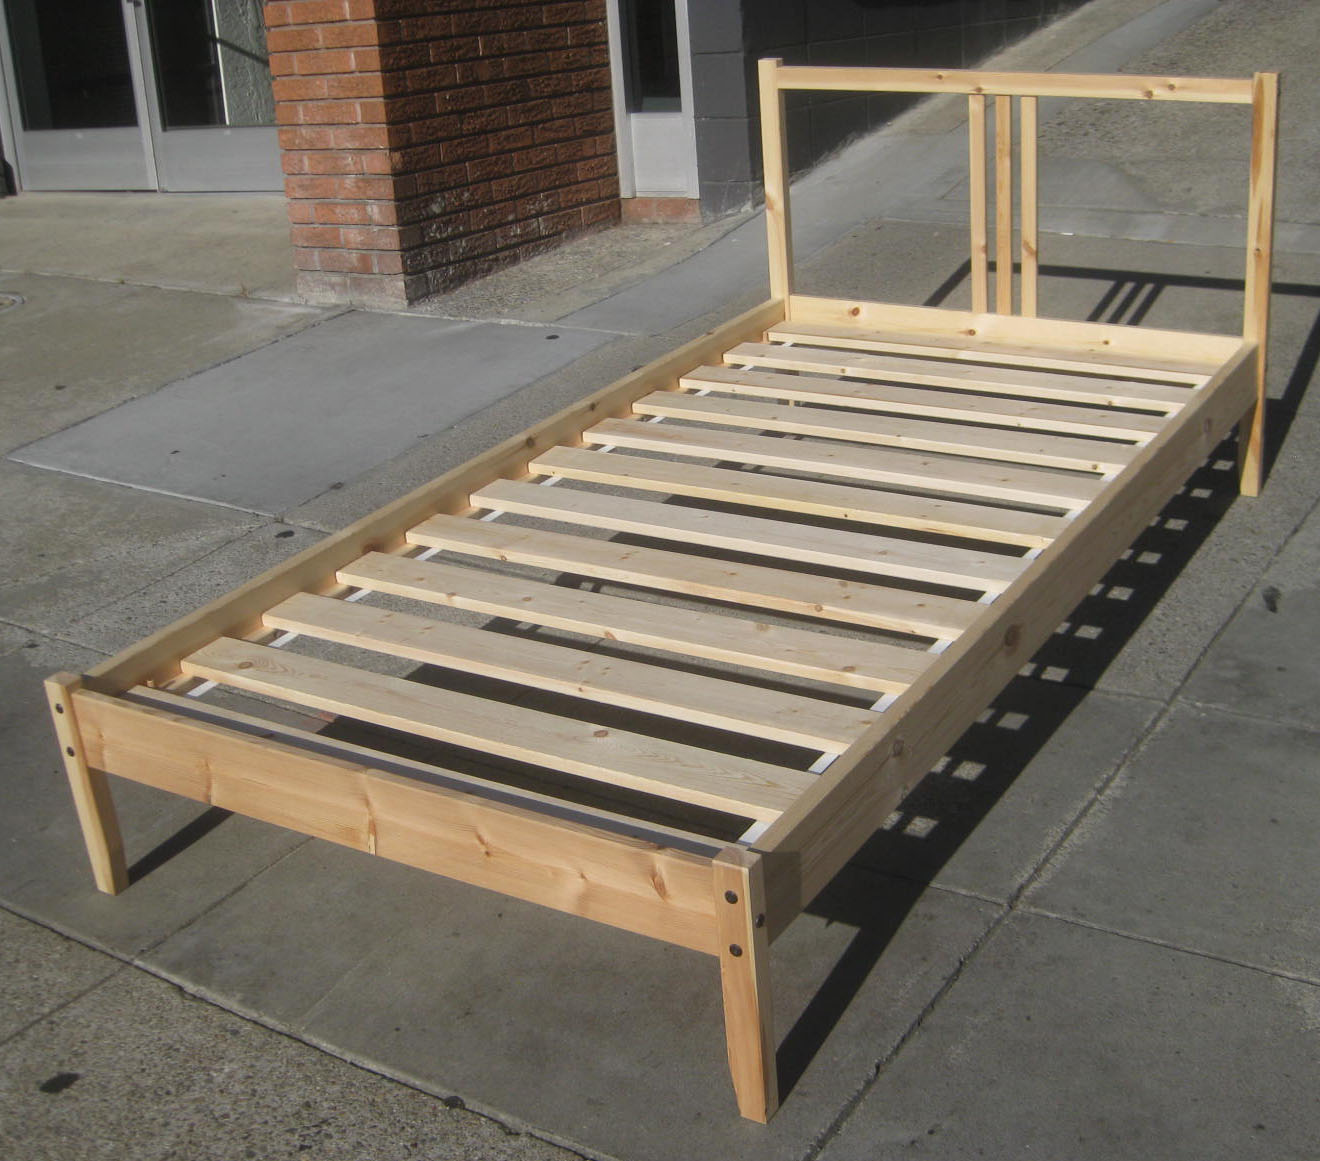 uhuru furniture collectibles sold twin ikea bed frame 45. Black Bedroom Furniture Sets. Home Design Ideas